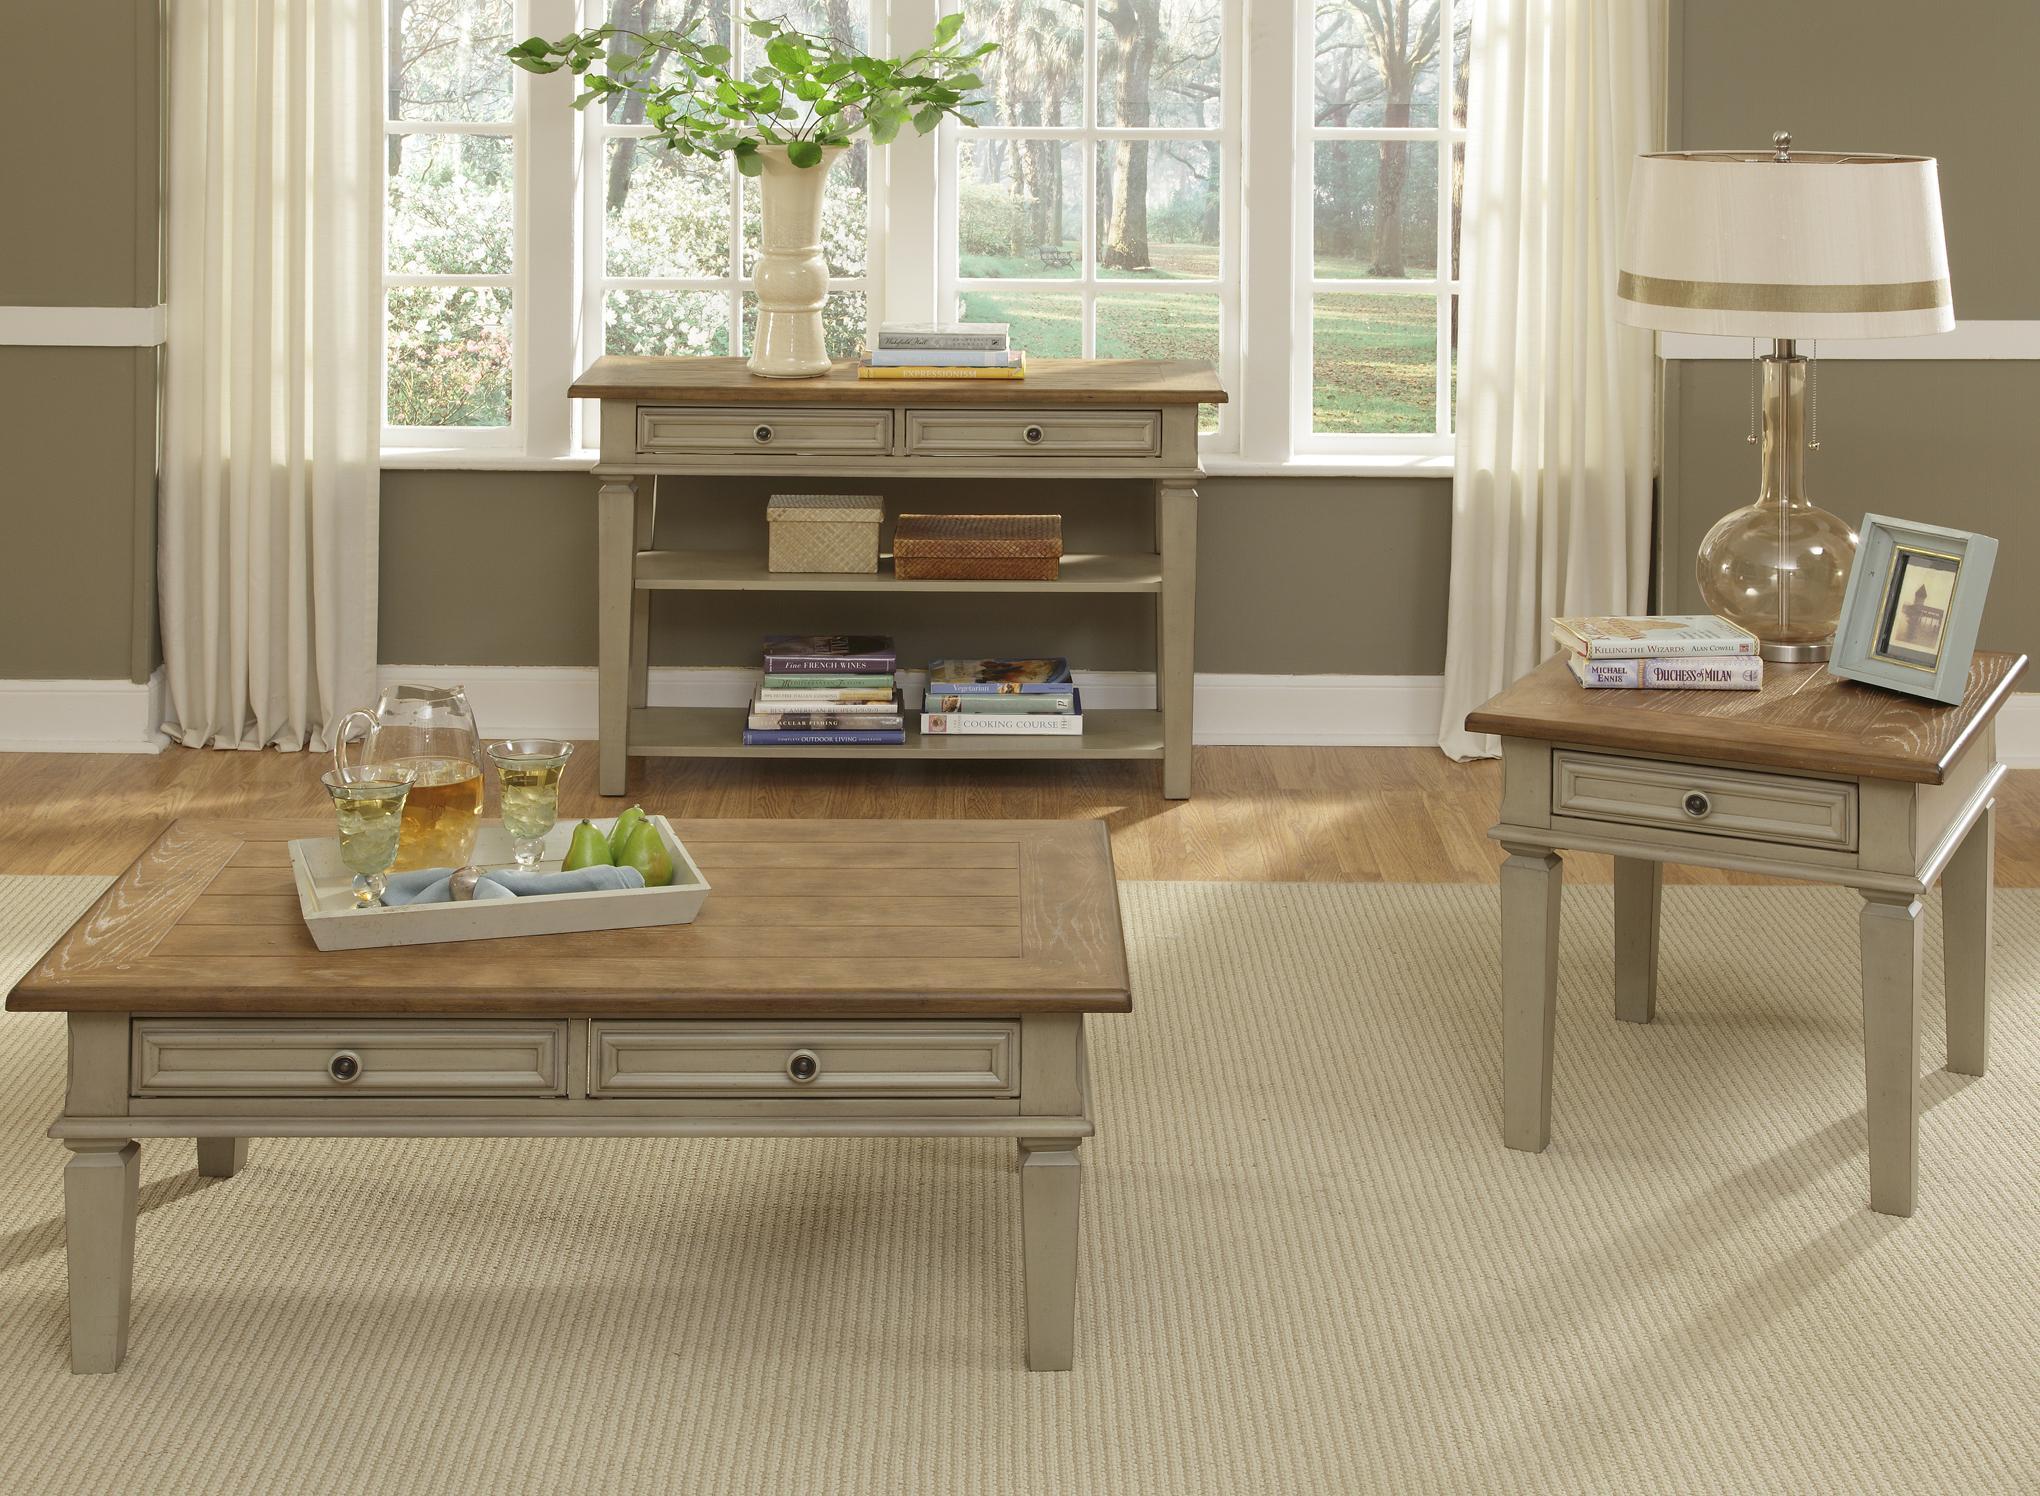 Ordinaire Liberty Furniture Bungalow 541 HOJ 3DH 3 Piece Desk U0026 Hutch Set | Northeast  Factory Direct | Desk U0026 Hutch Sets Cleveland, Eastlake, Westlake, Mentor,  ...